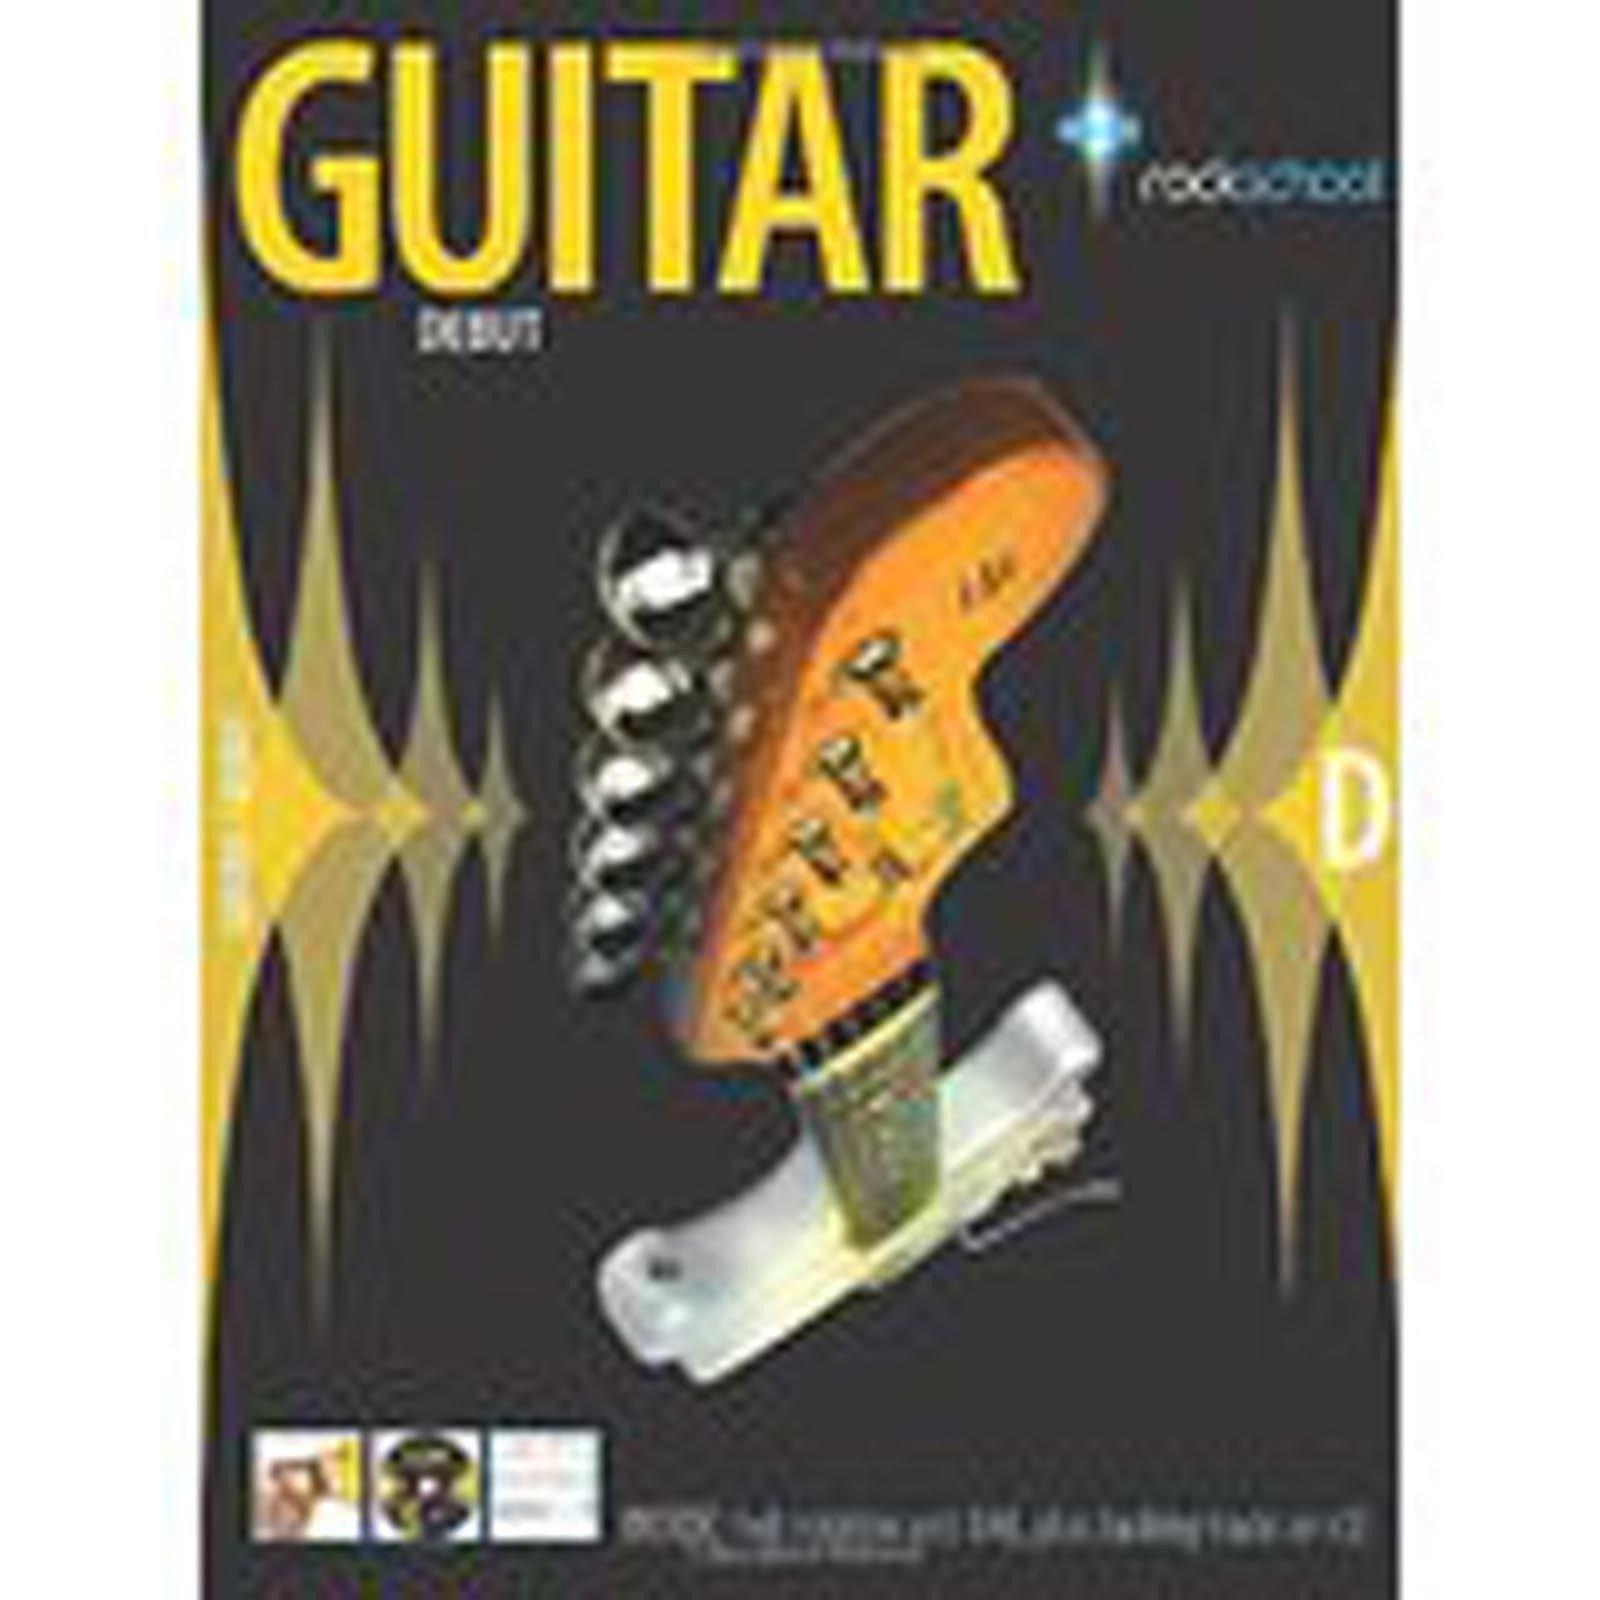 Rockschool Guitar Debut Book CD Tab Sheet Music S91